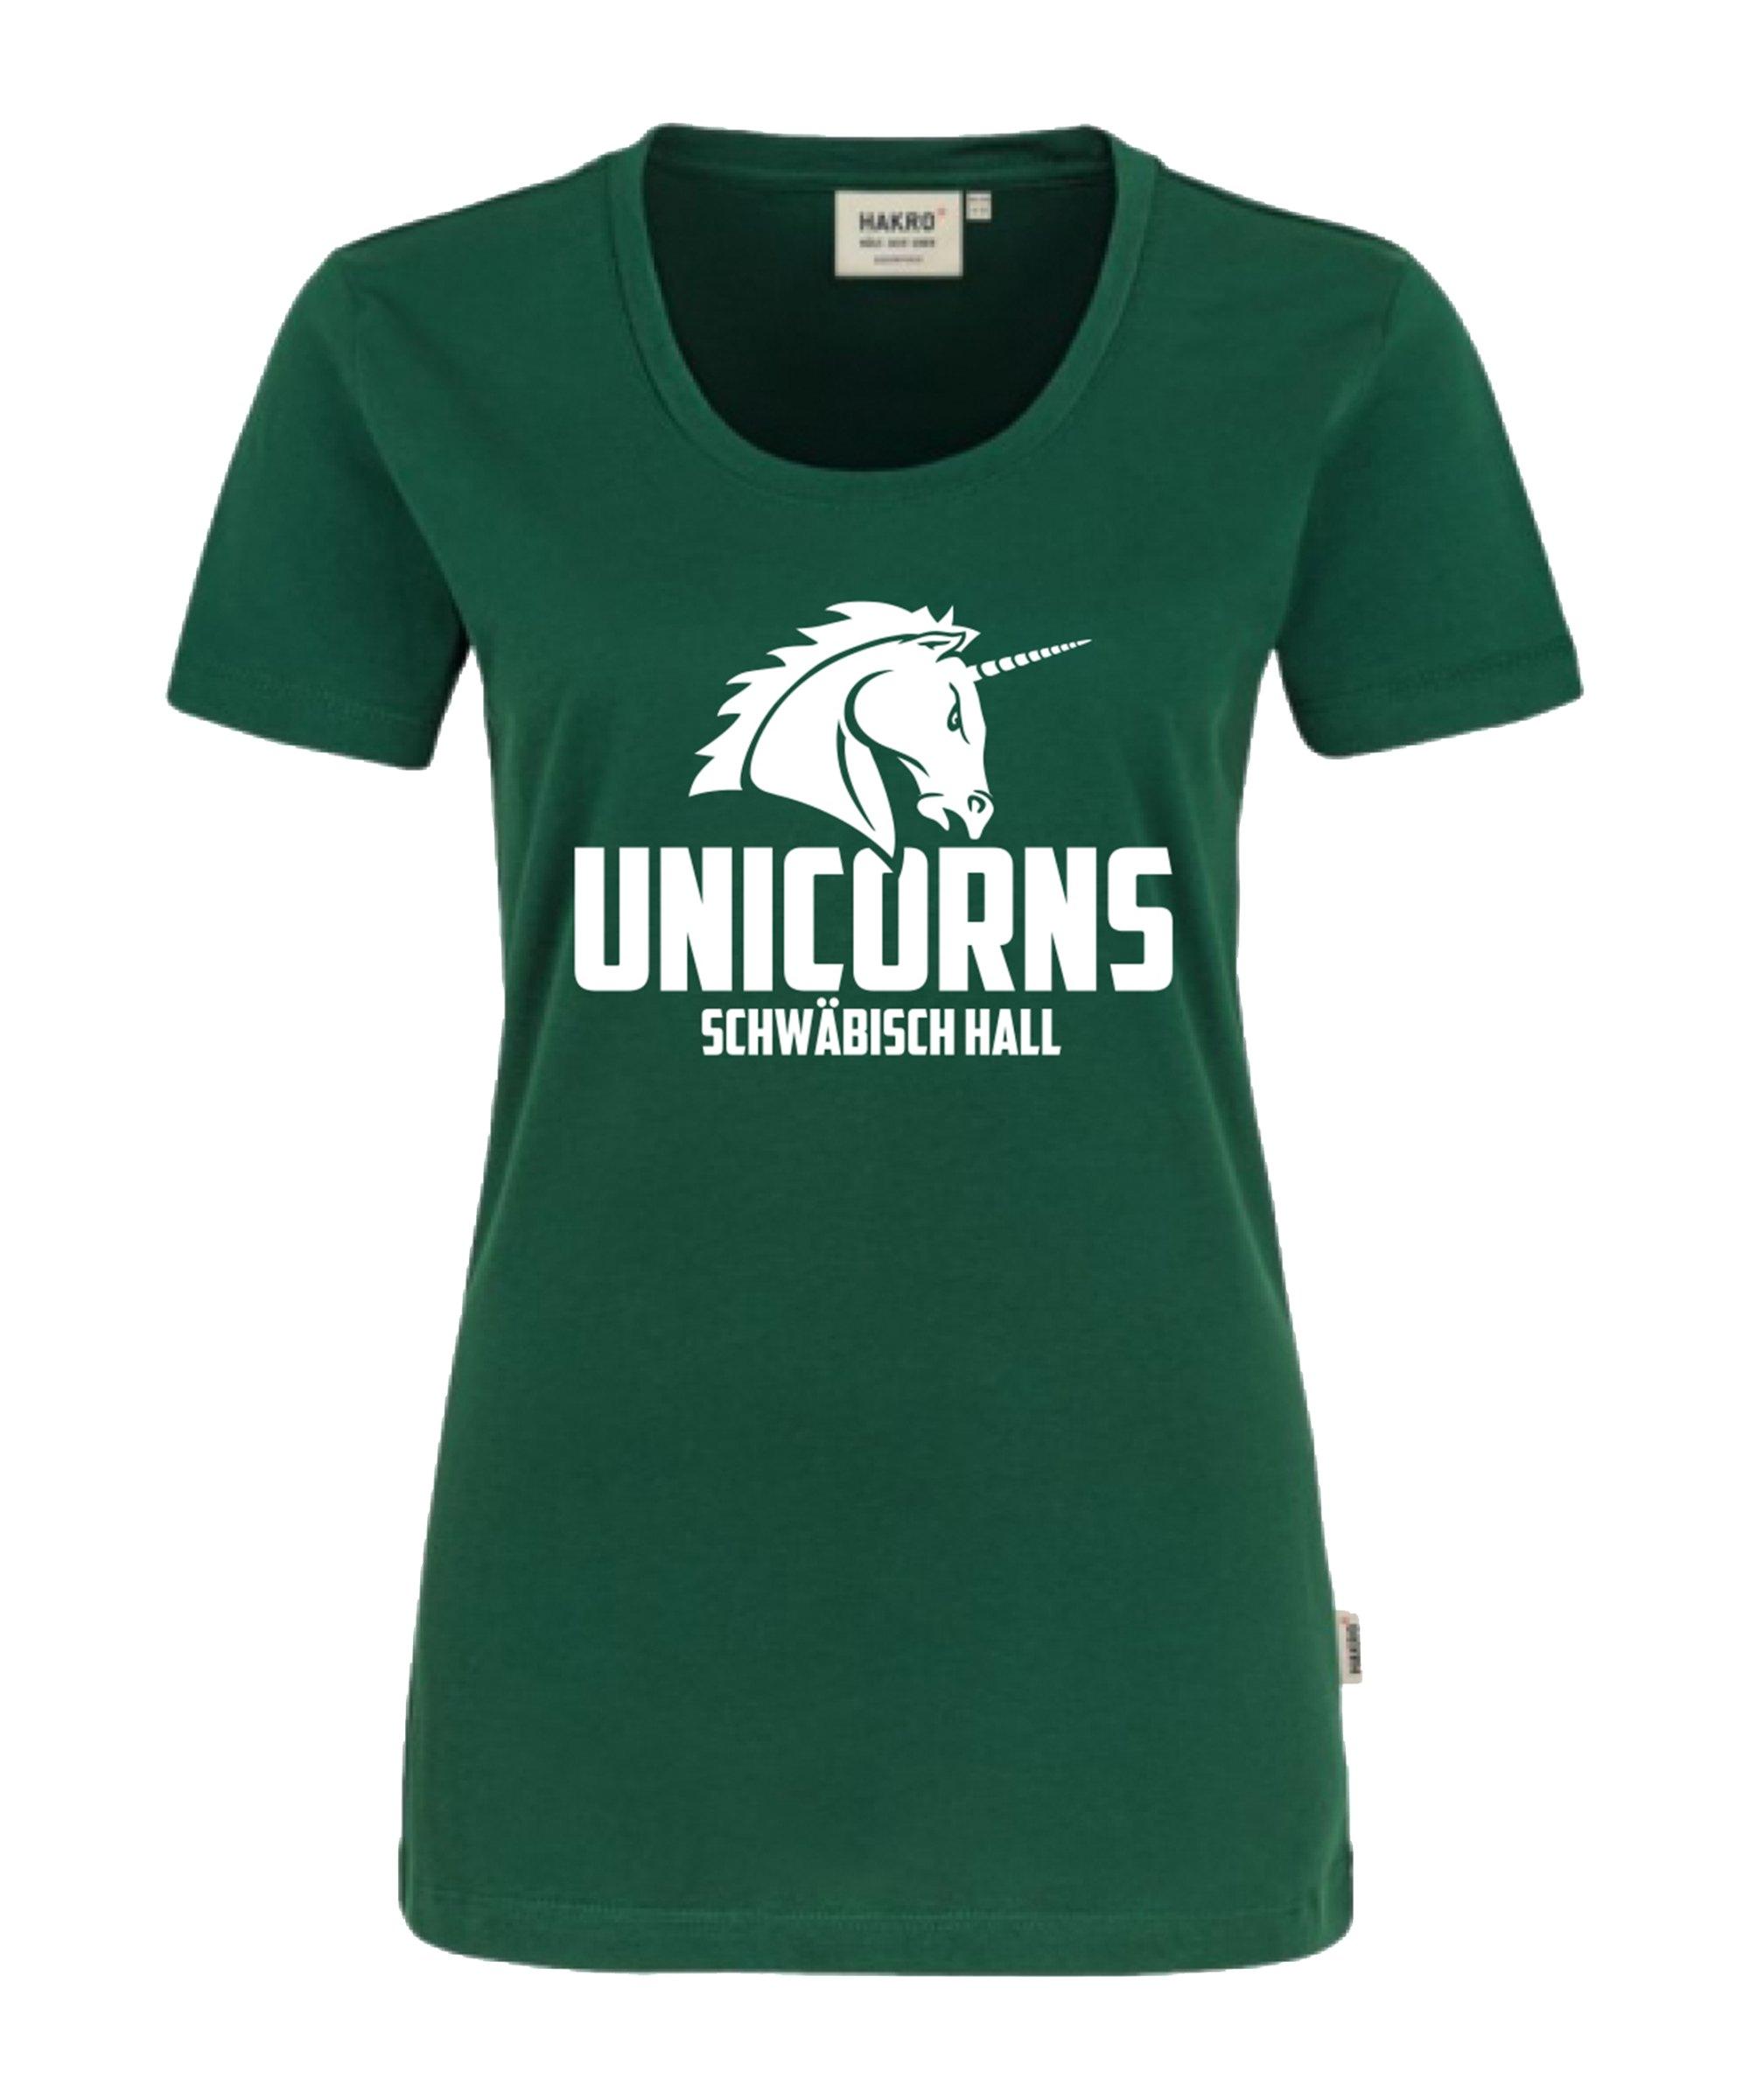 Unicorns Classic T-Shirt Damen Grün - gruen